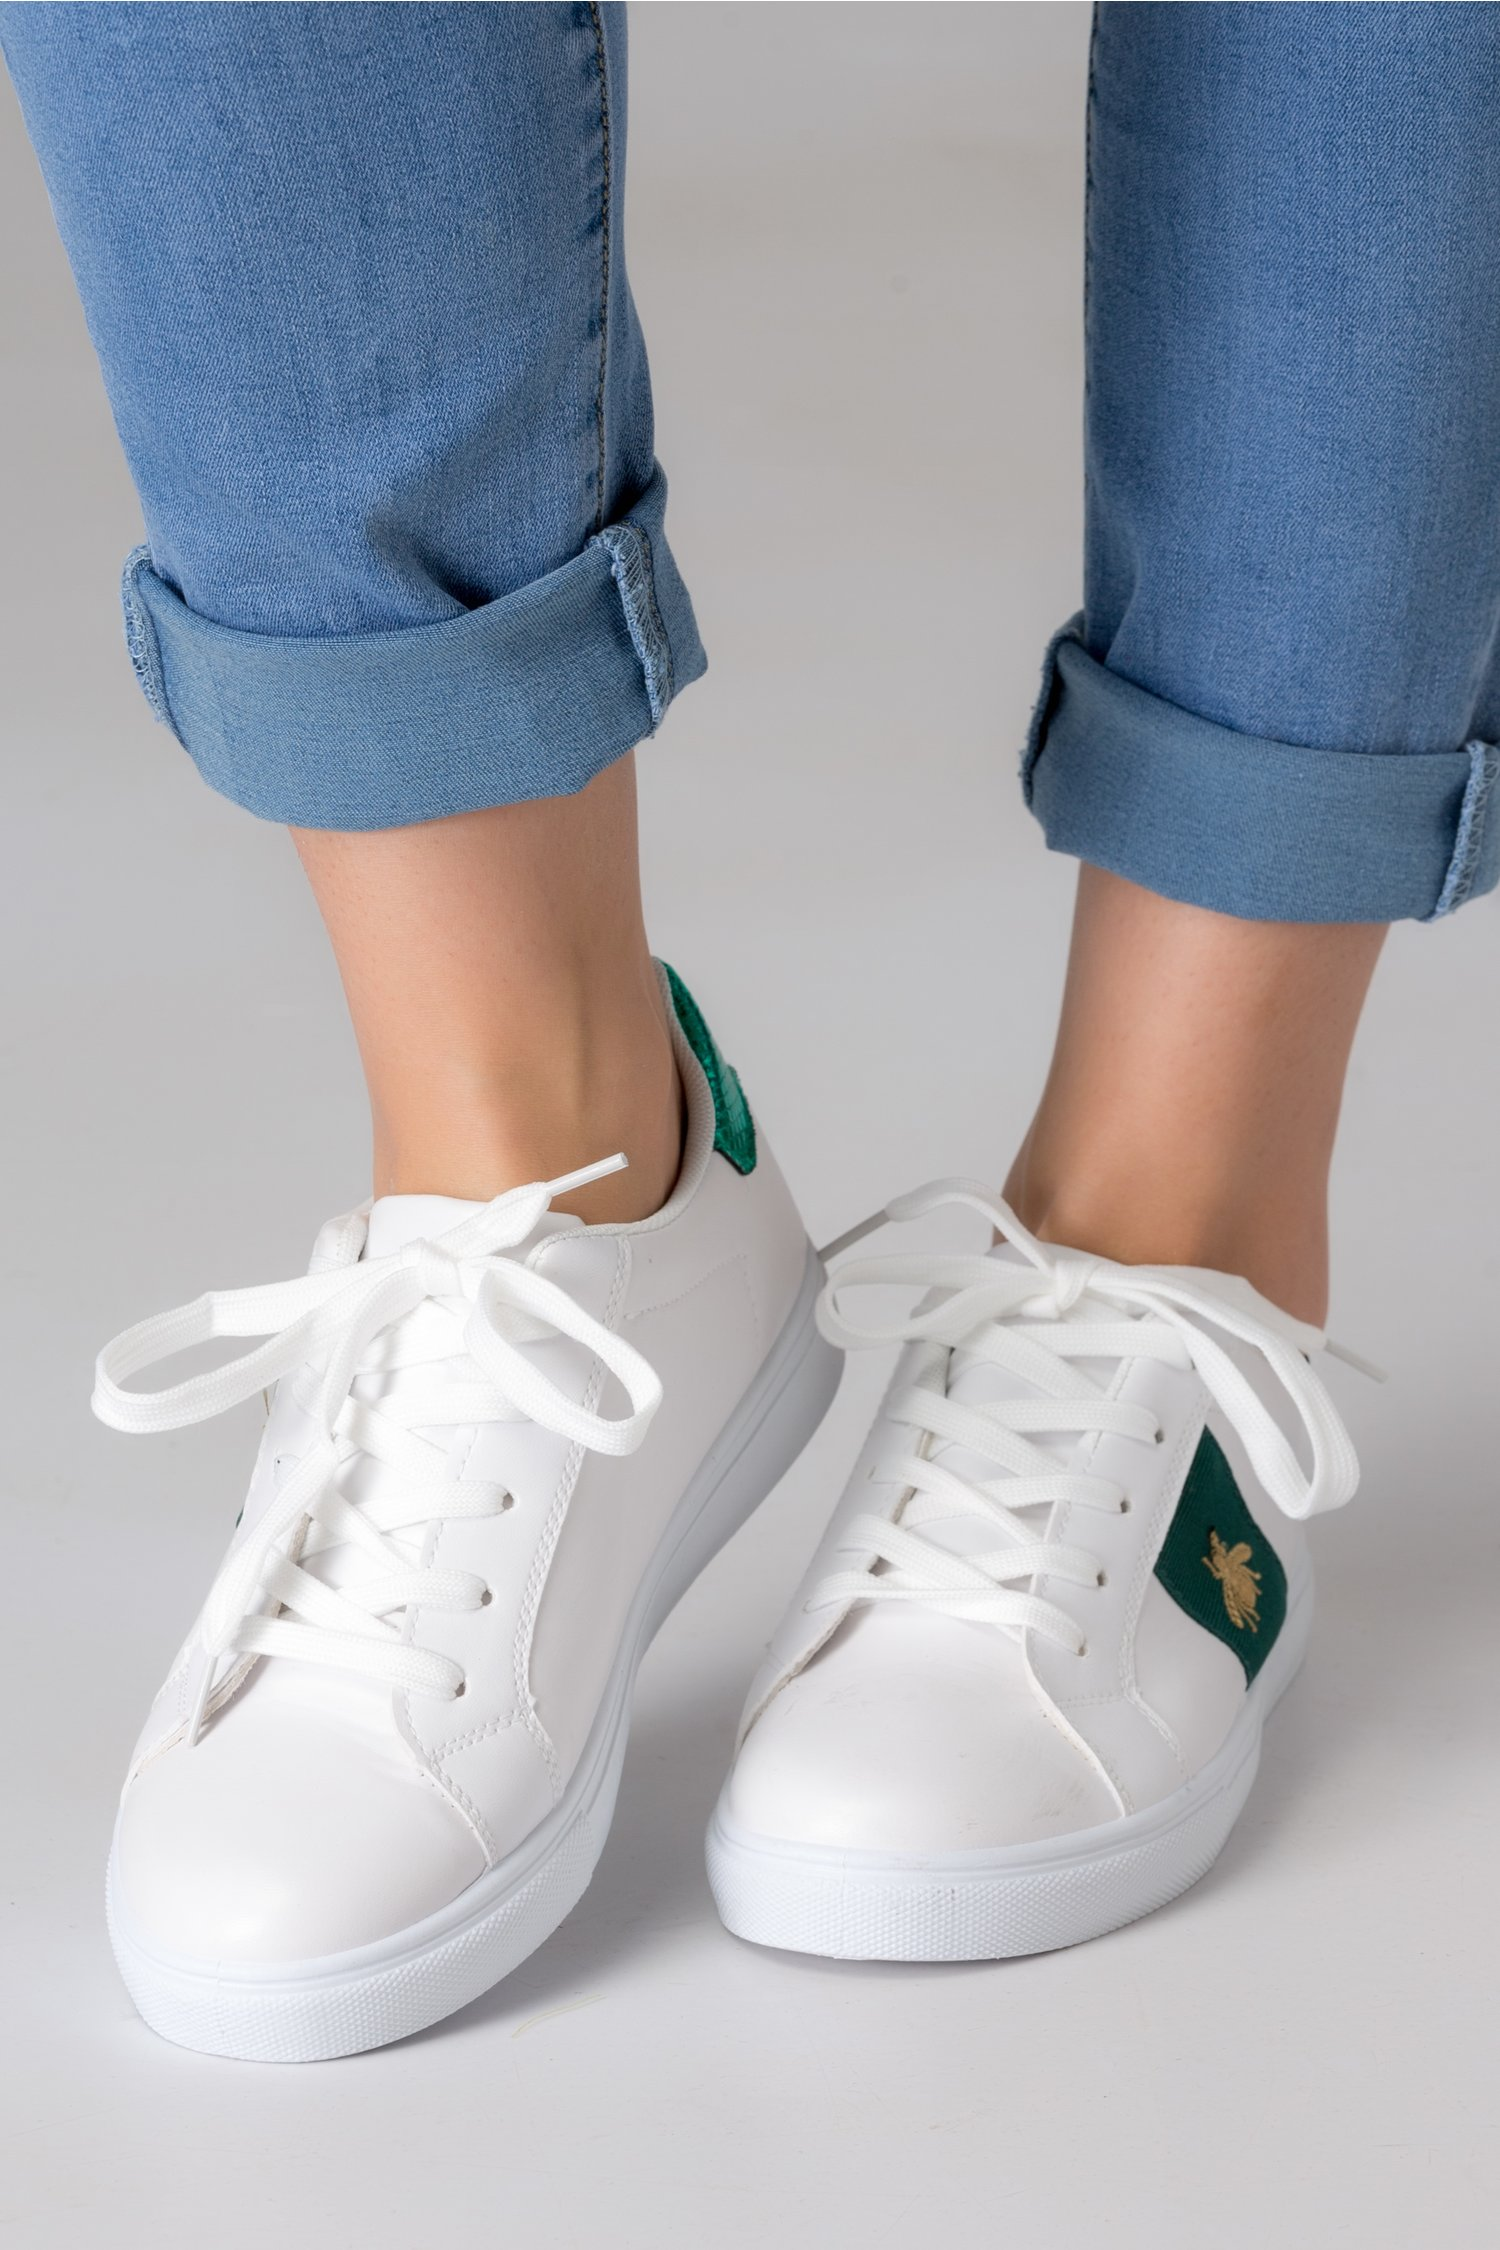 Pantofi sport Alexe albi cu insertii verzi